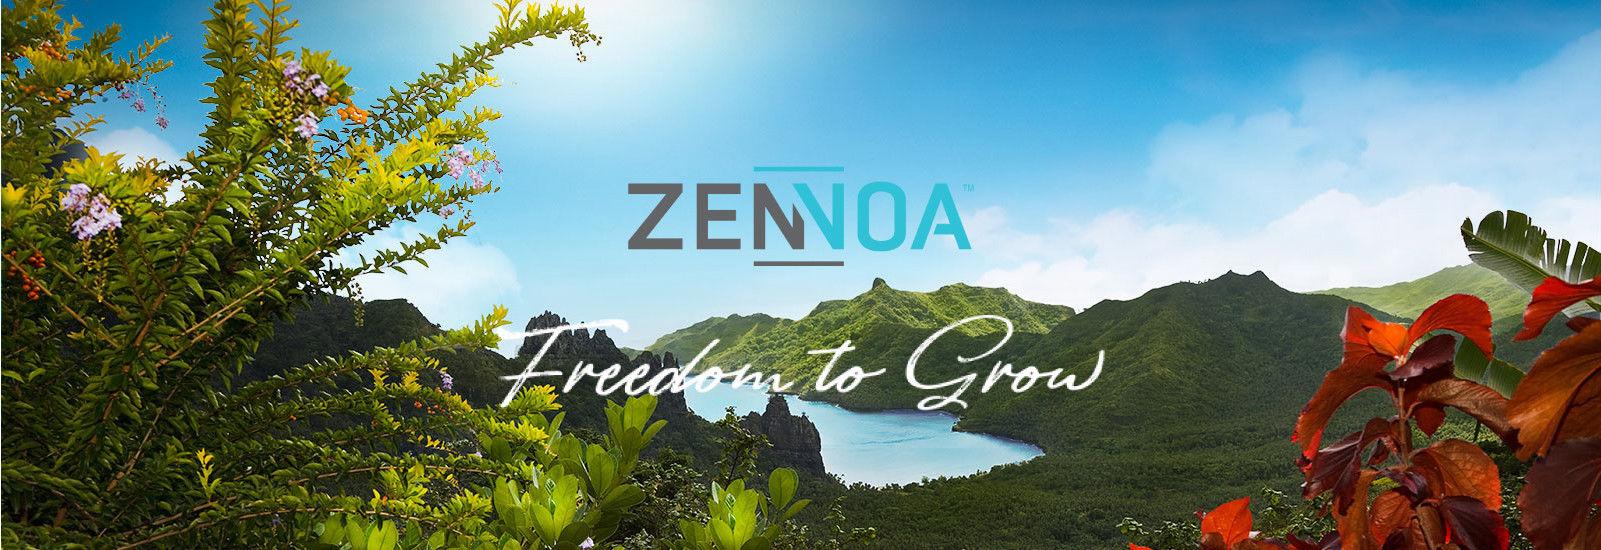 ZENNOAゼンノア商品ショッピングモール